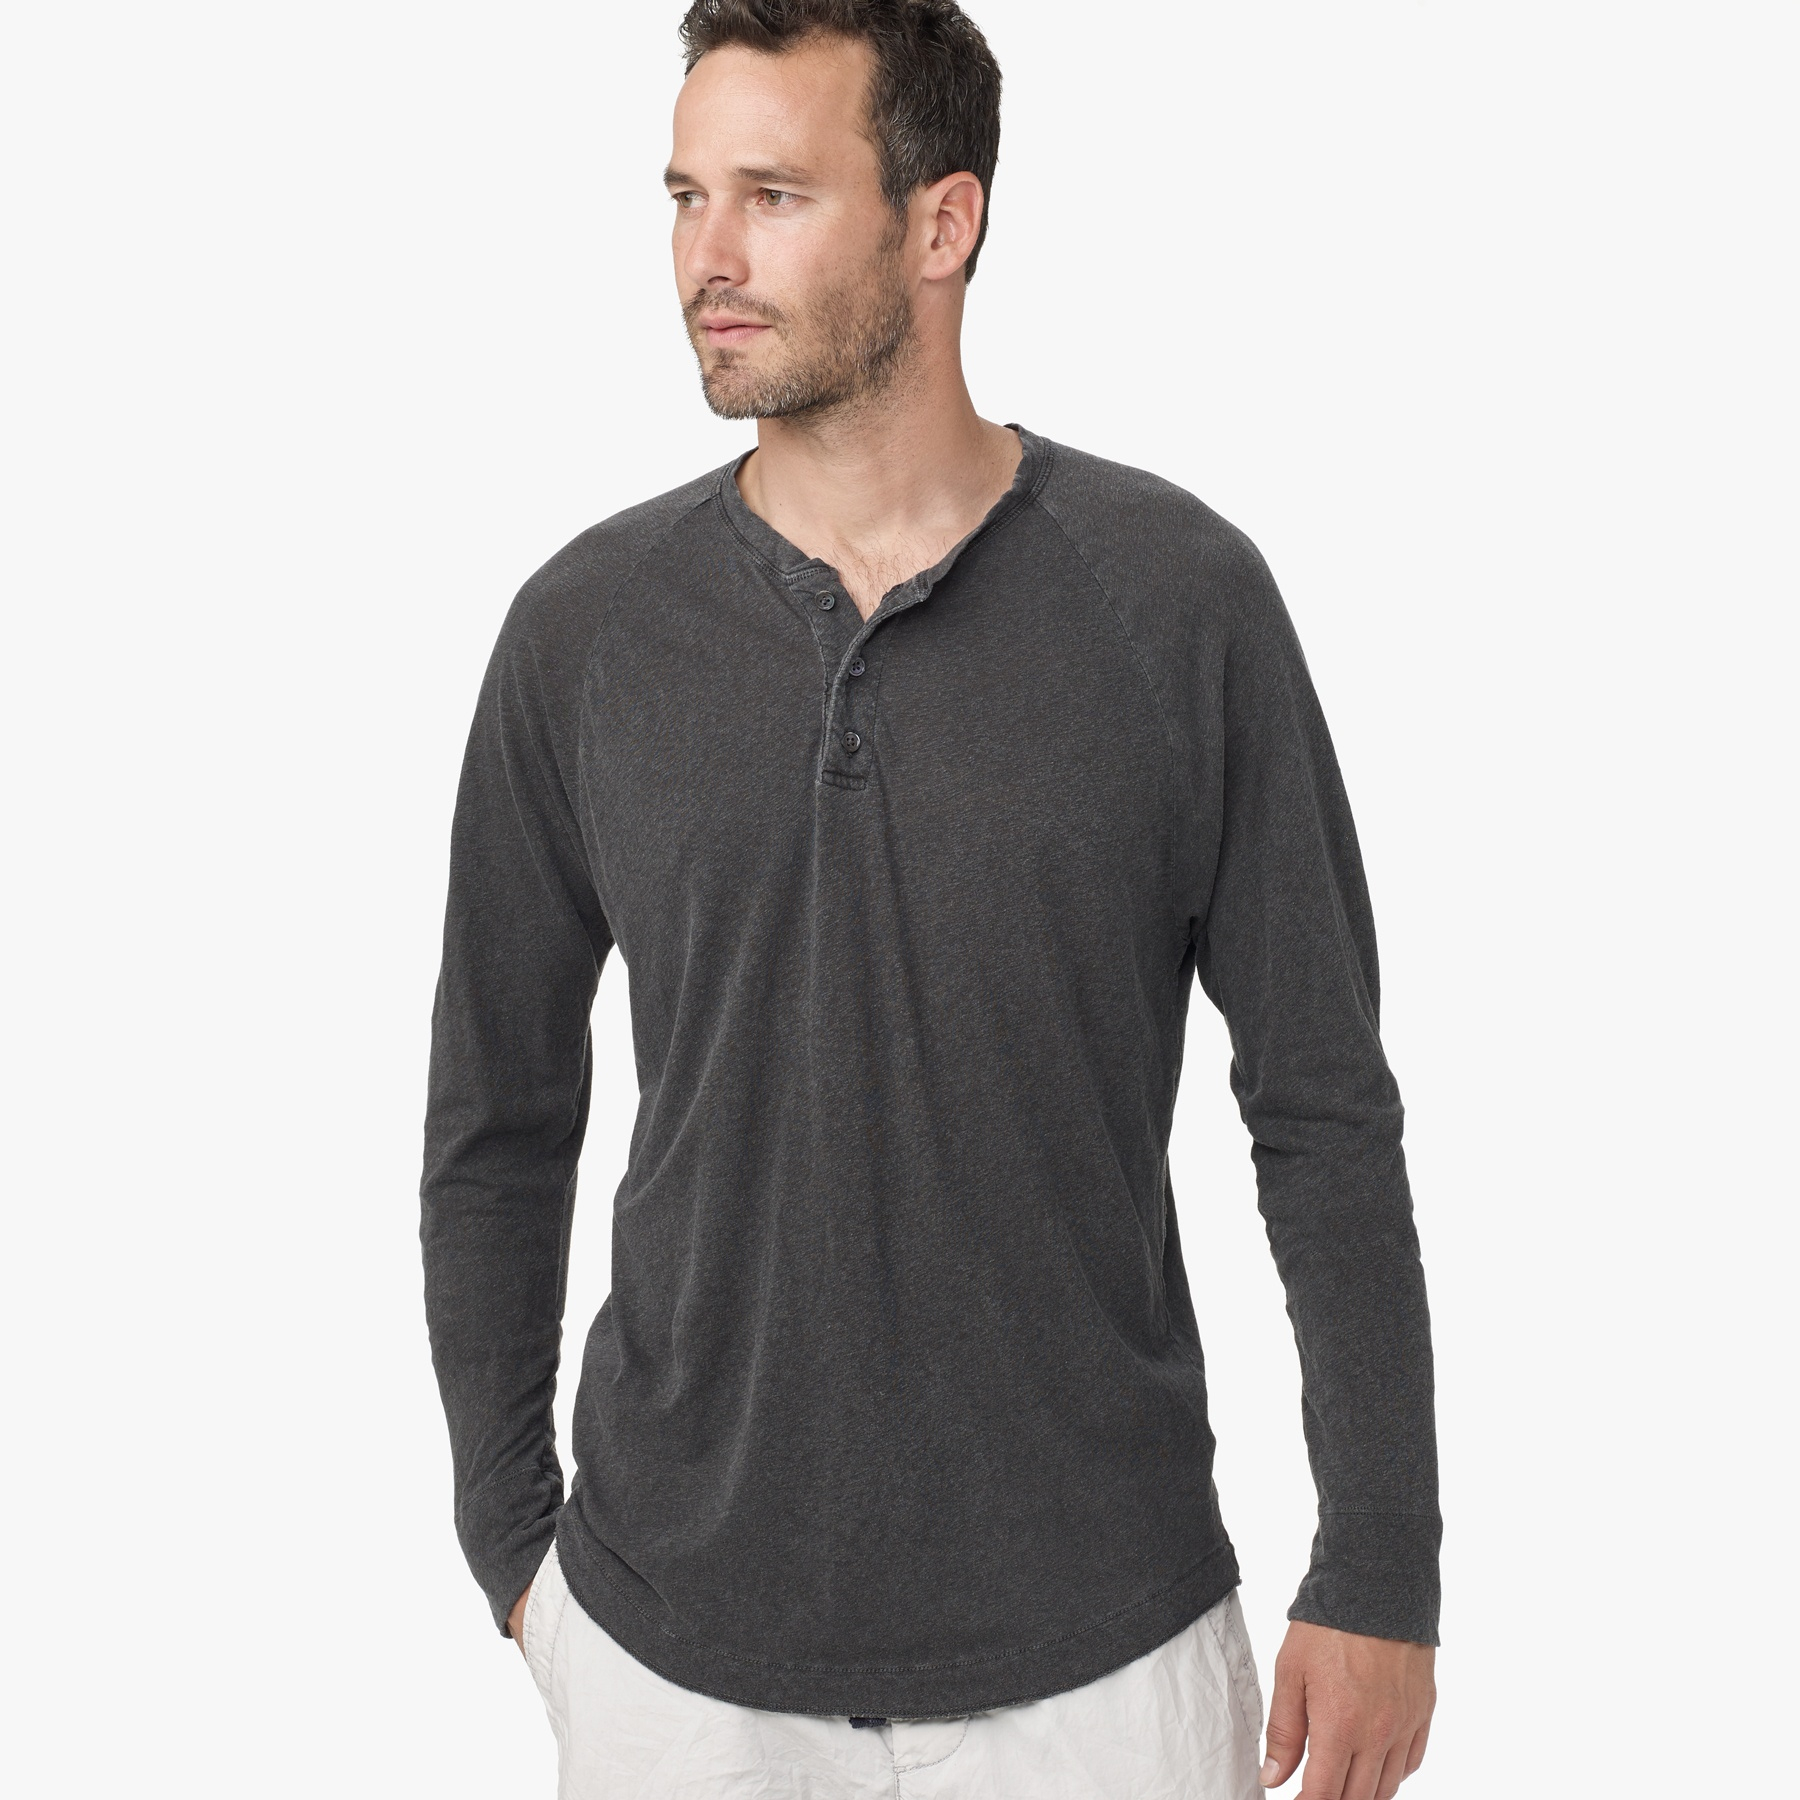 Lyst James Perse Linen Cotton Raglan Henley In Gray For Men